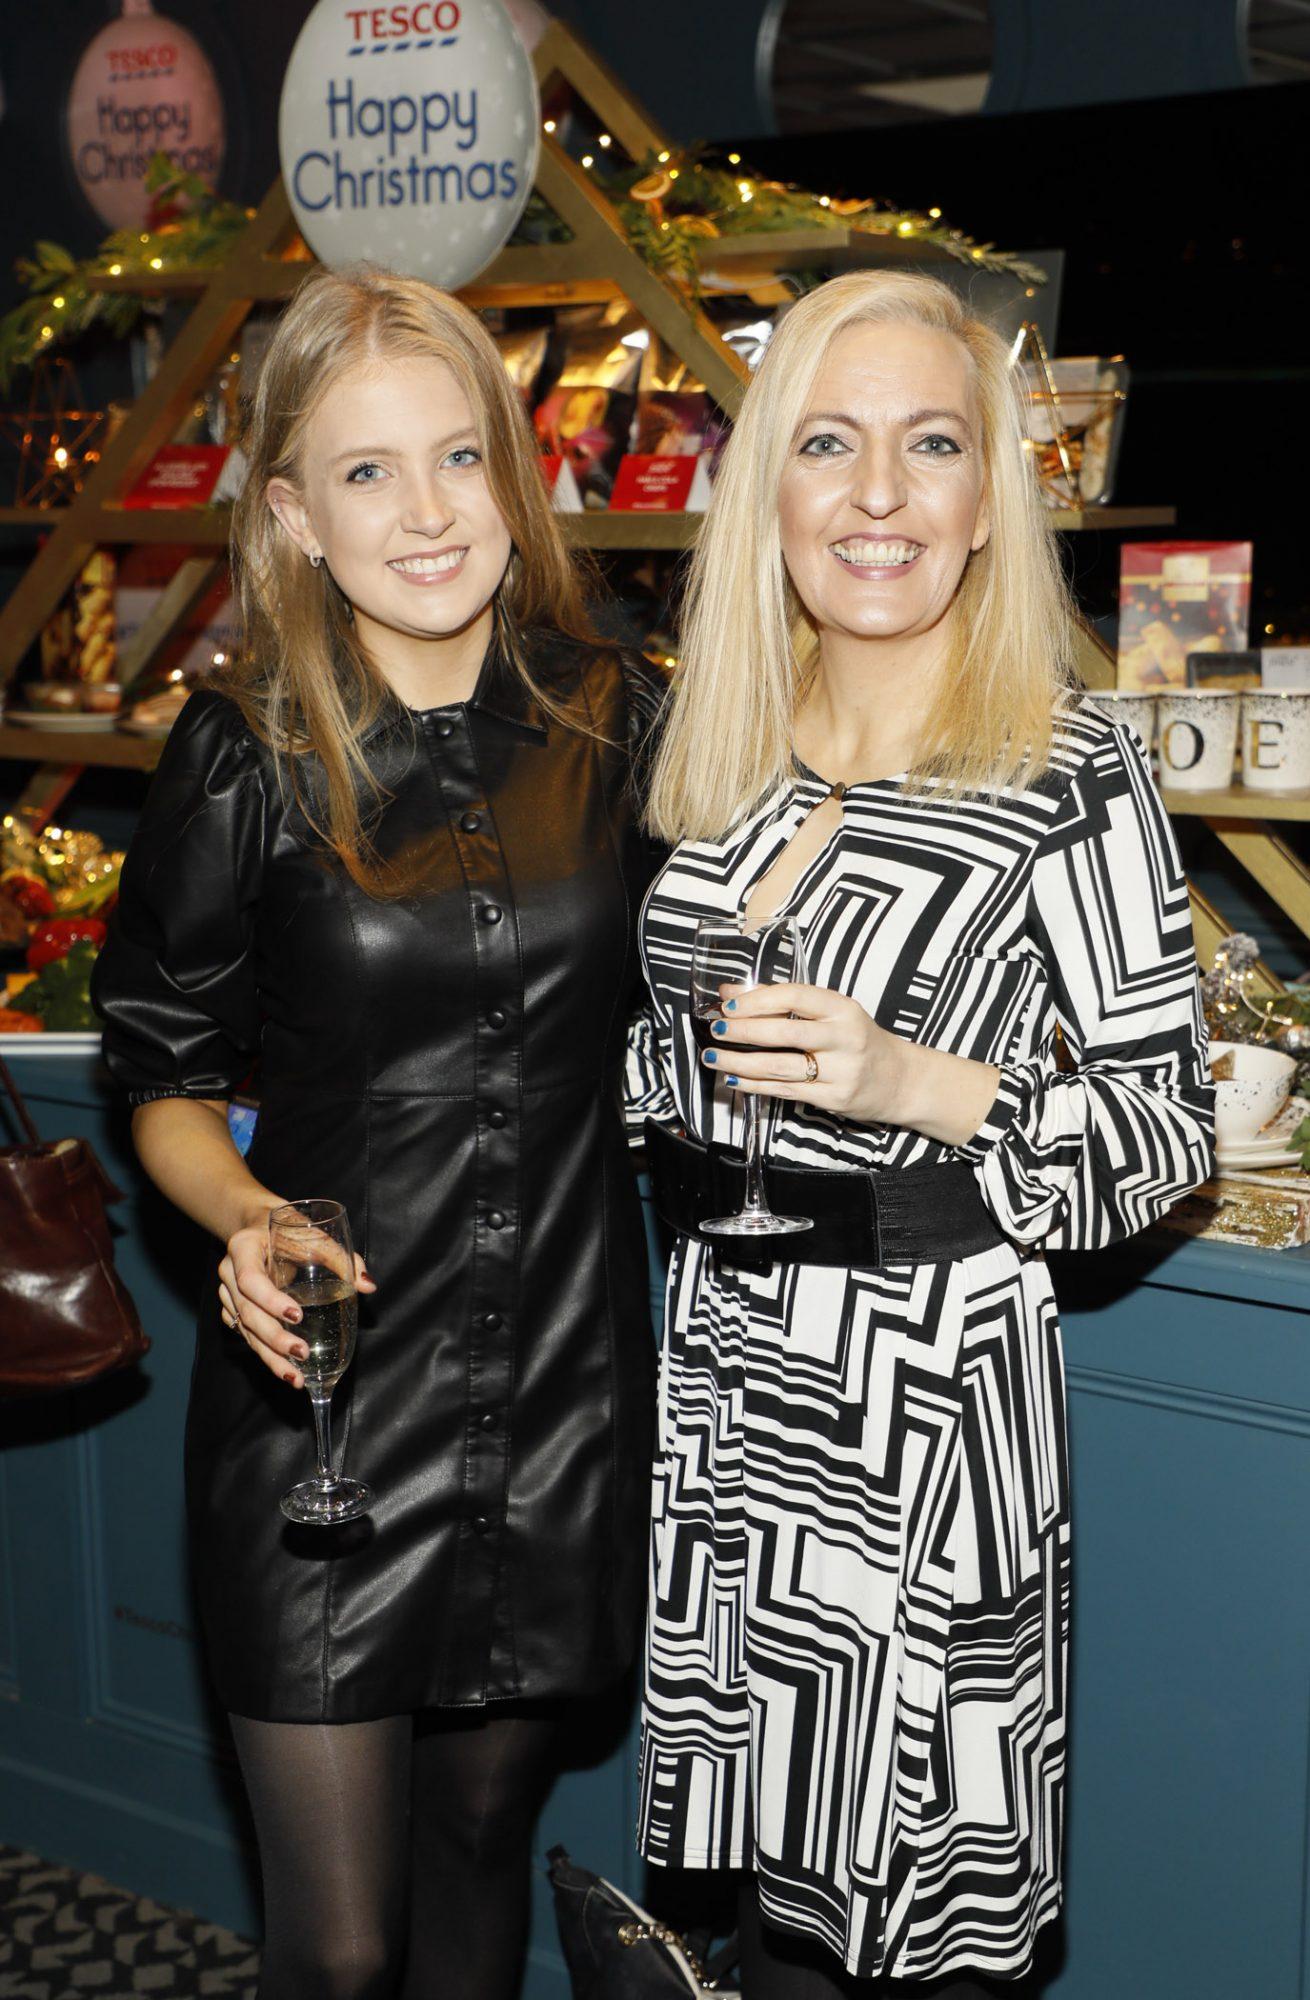 Chloe and Jess Hogan at the Tesco 2019 Christmas Showcase in Dublin's Iveagh Garden Hotel.   Photo: Kieran Harnett